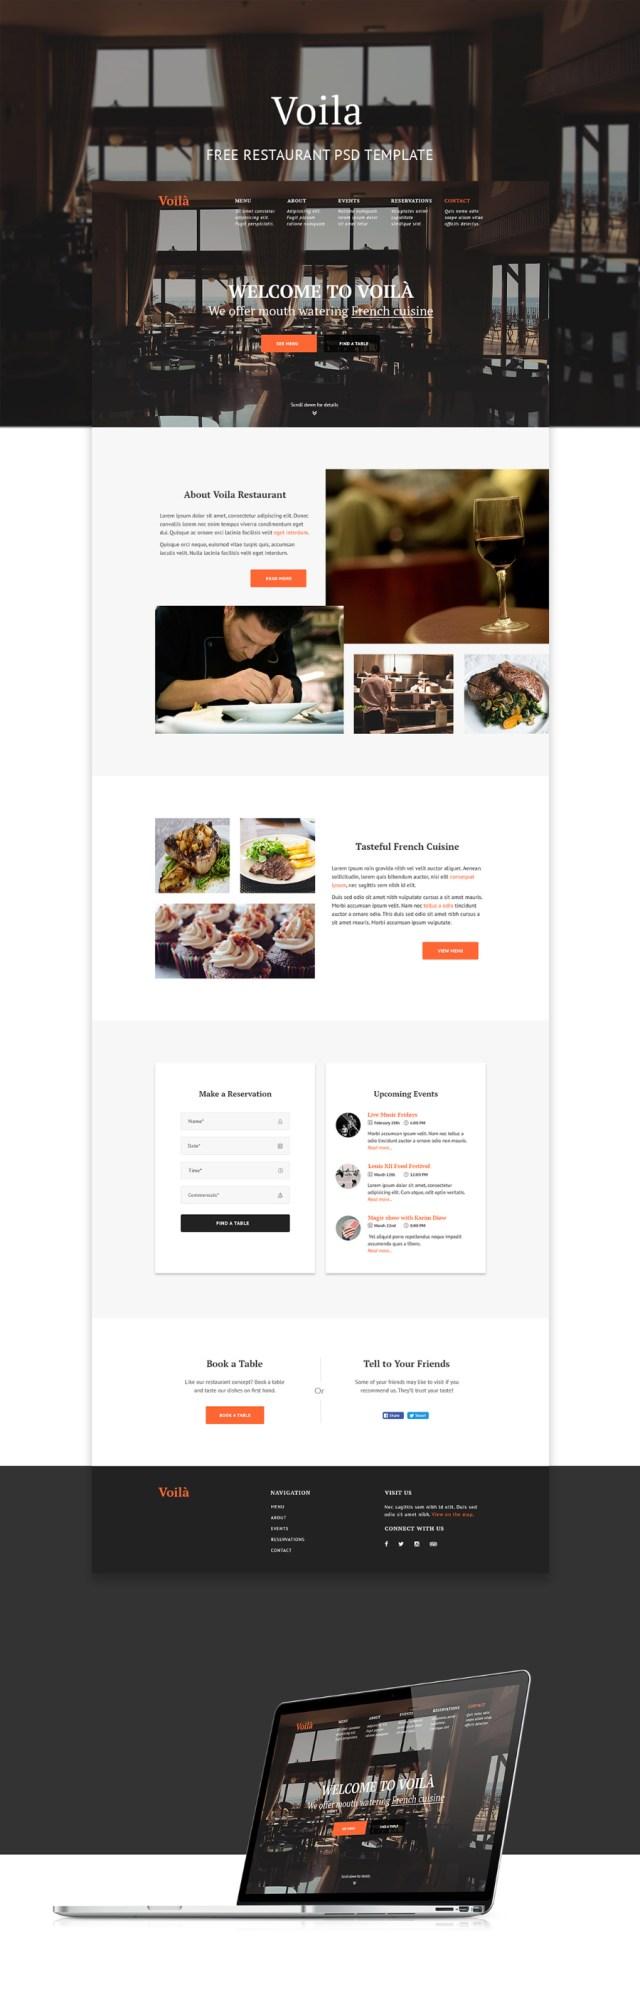 Voila Restaurant Free PSD Template